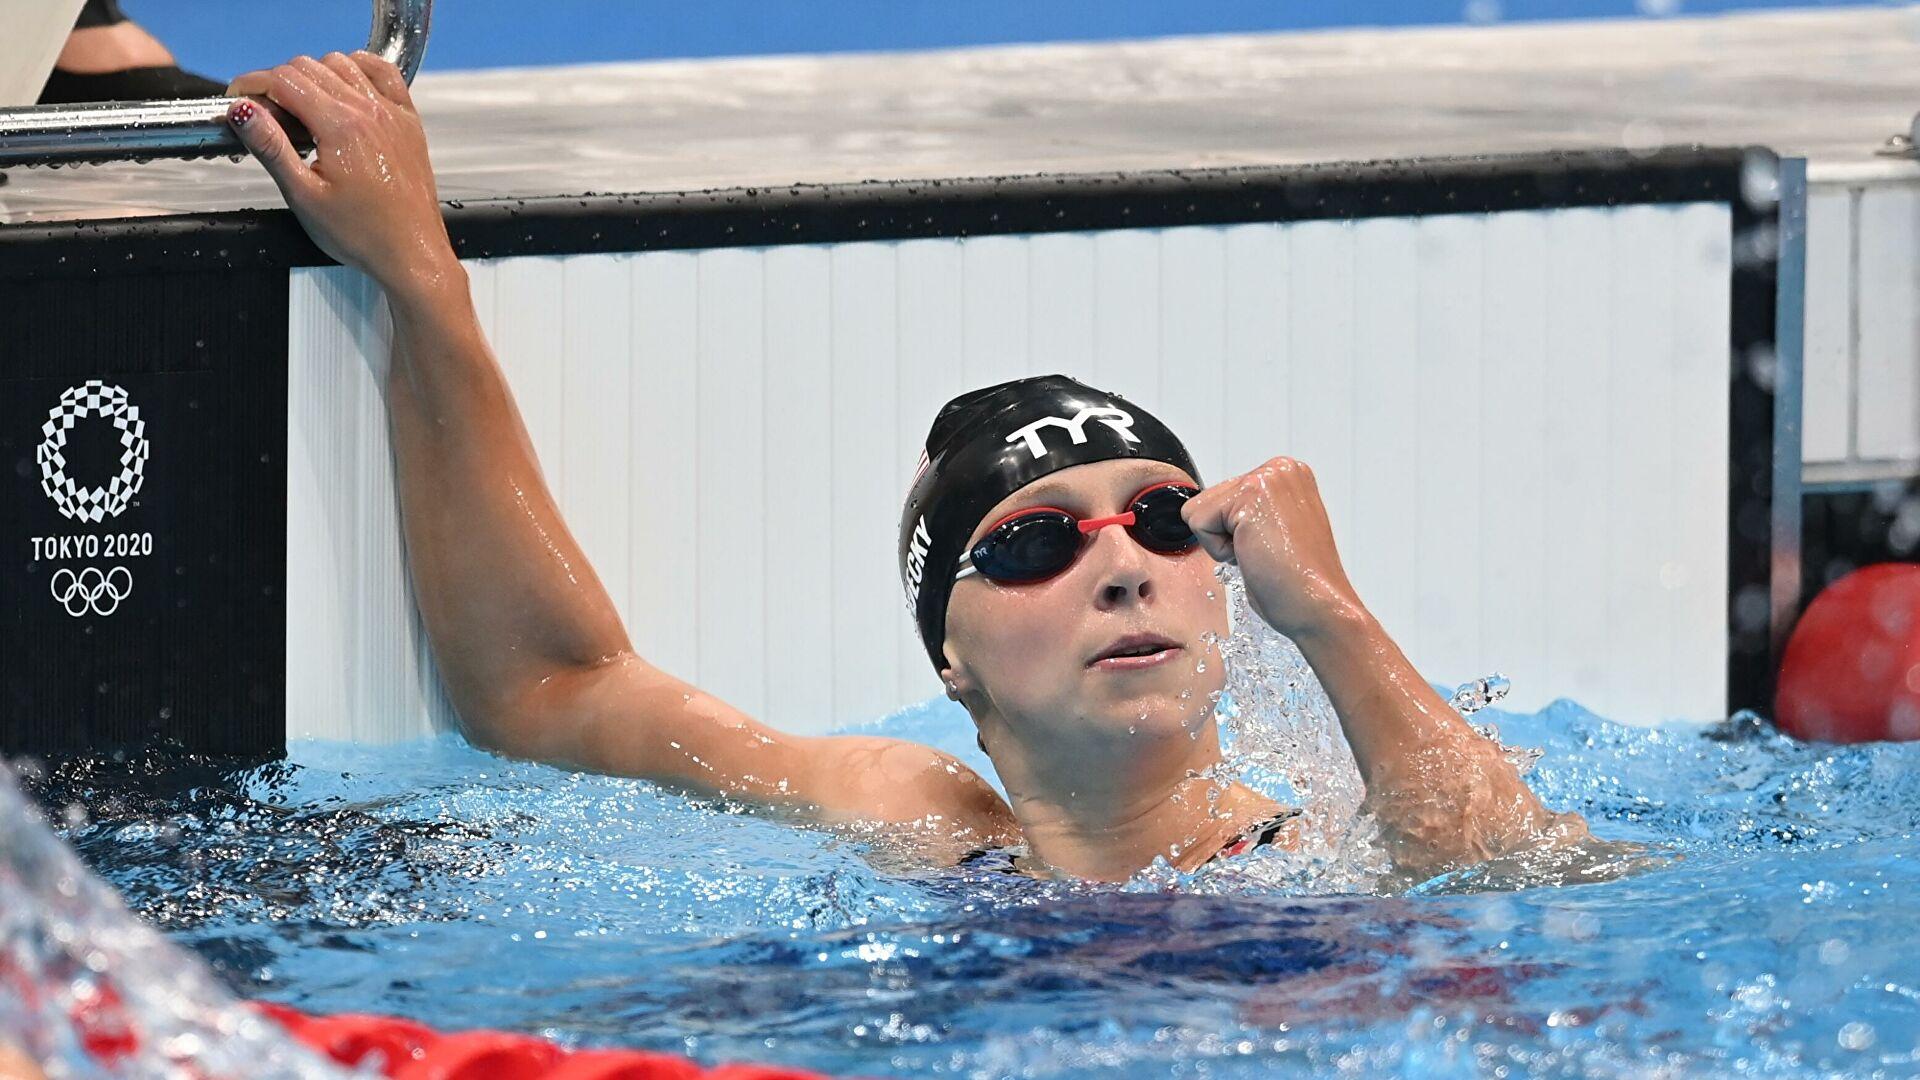 ABŞ idmançısından 7-ci qızıl medal